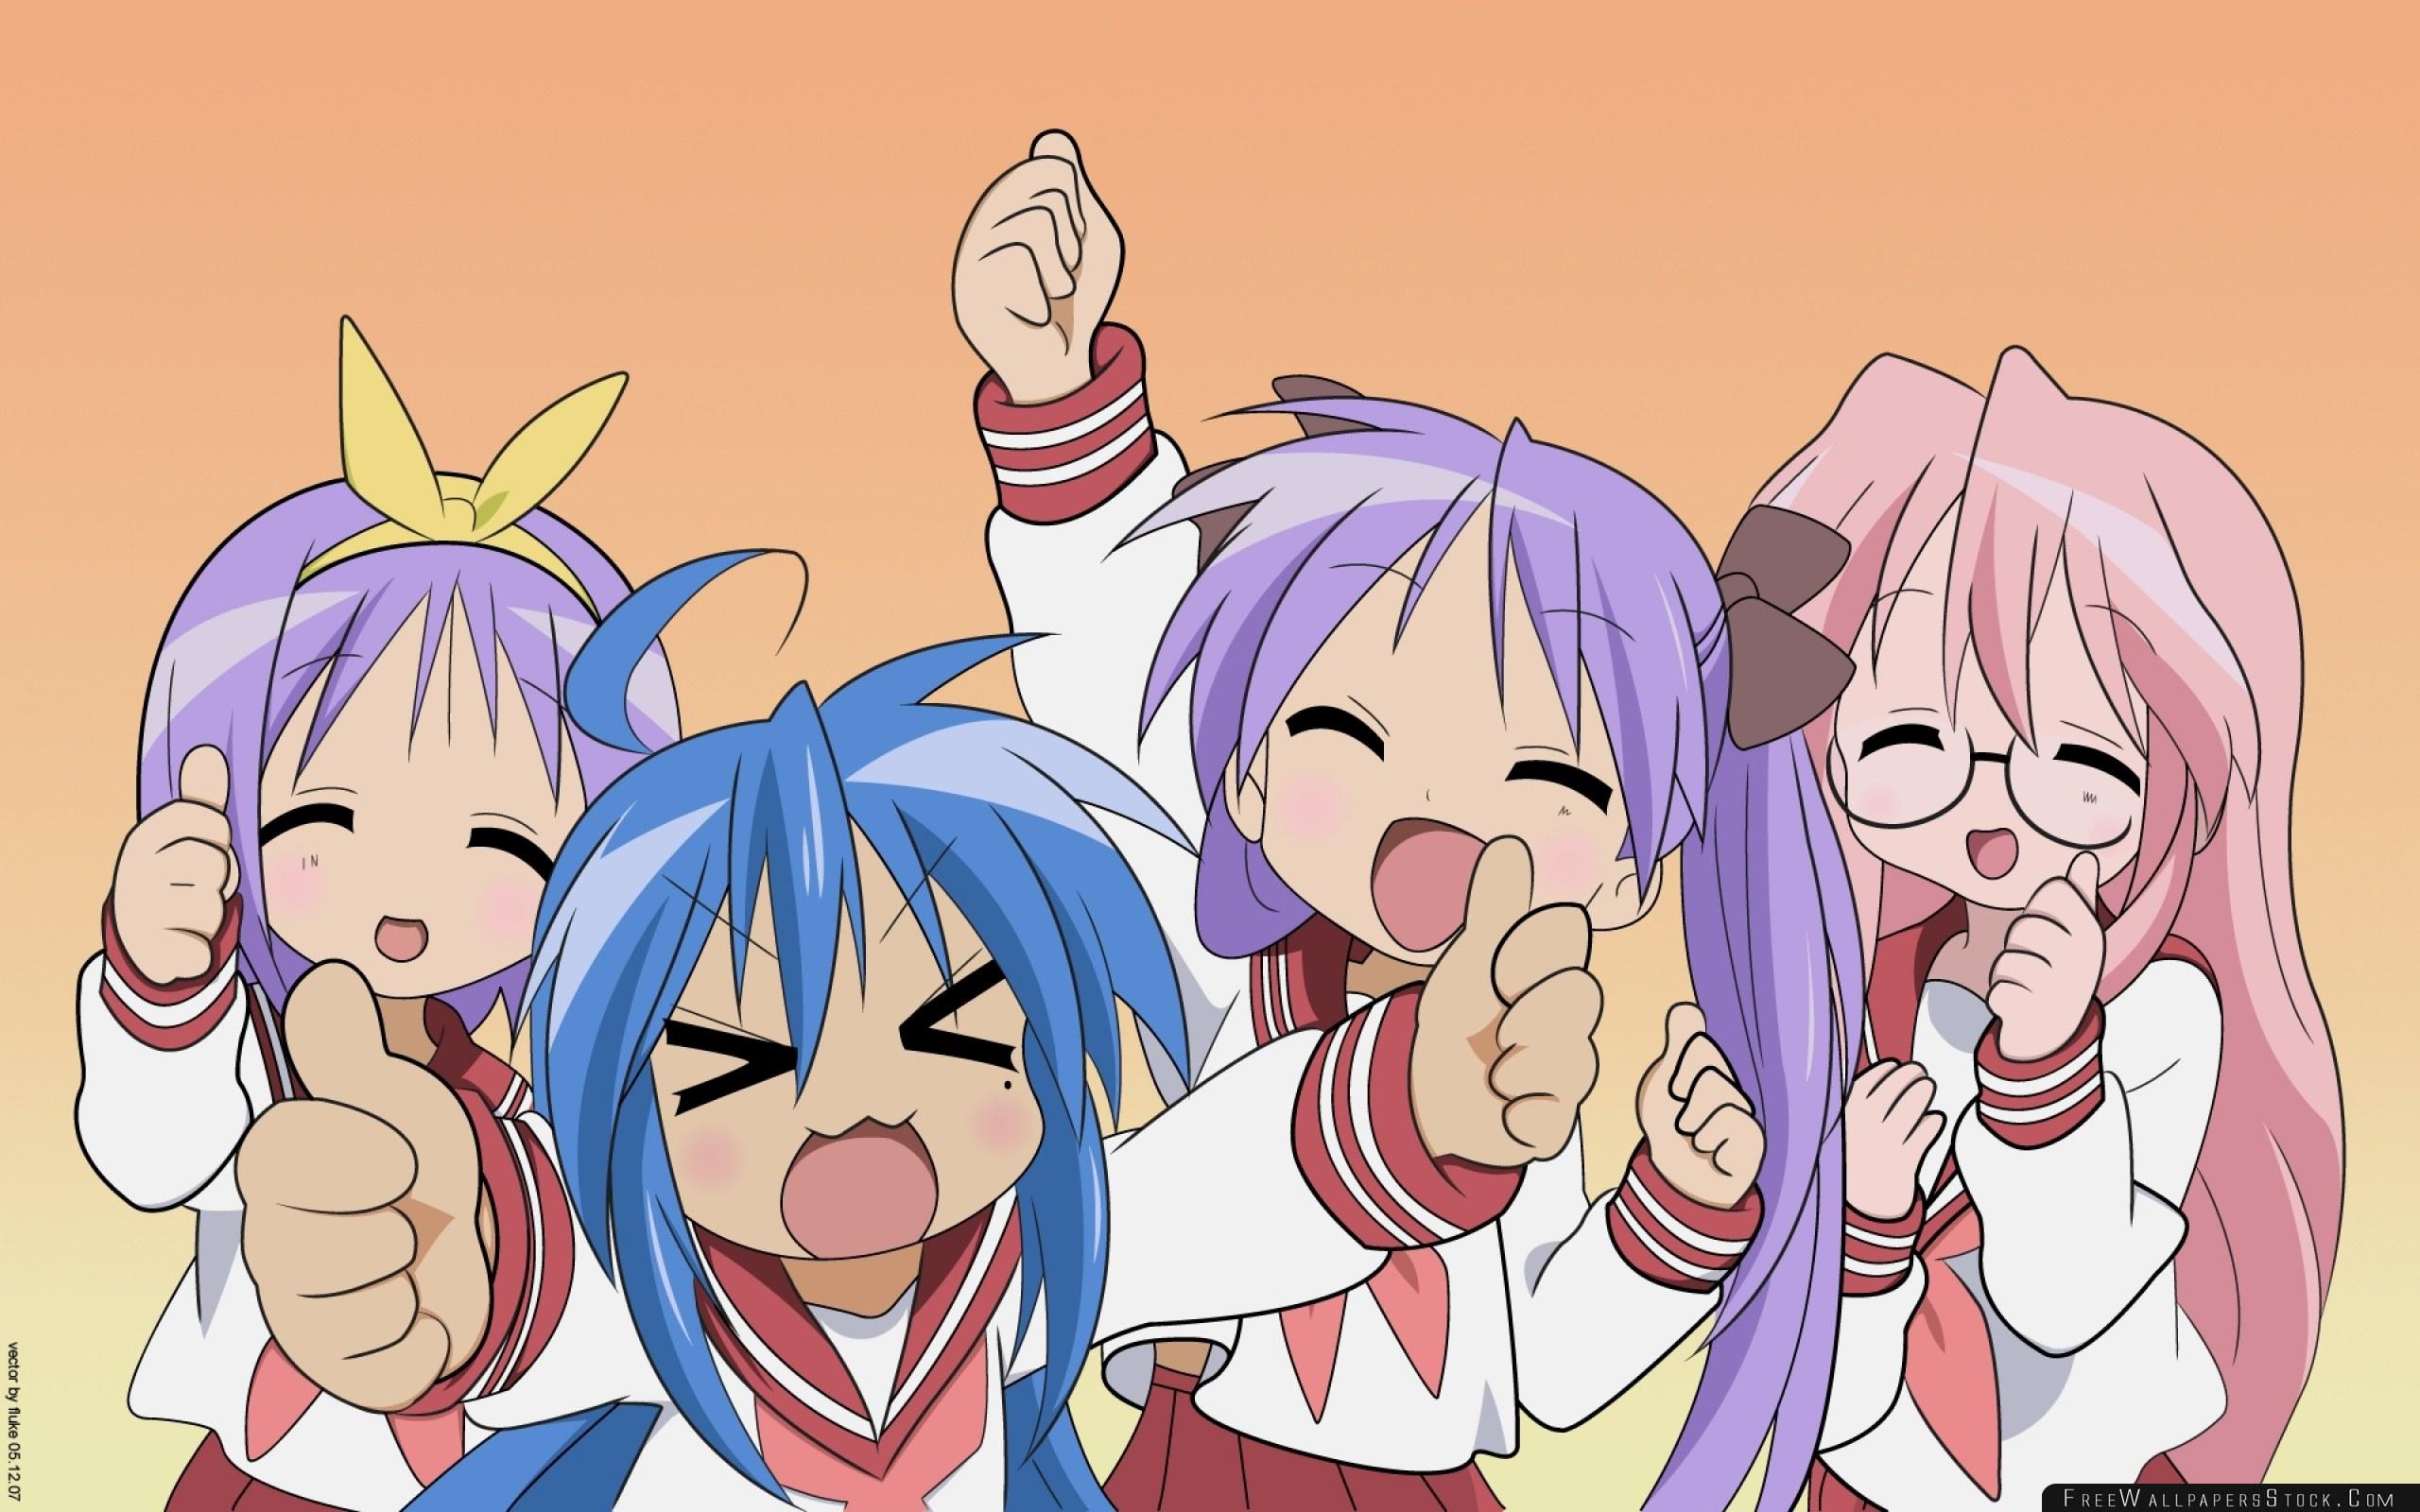 Download Free Wallpaper Anime Girls Crowd Emotion Laughter Surprise